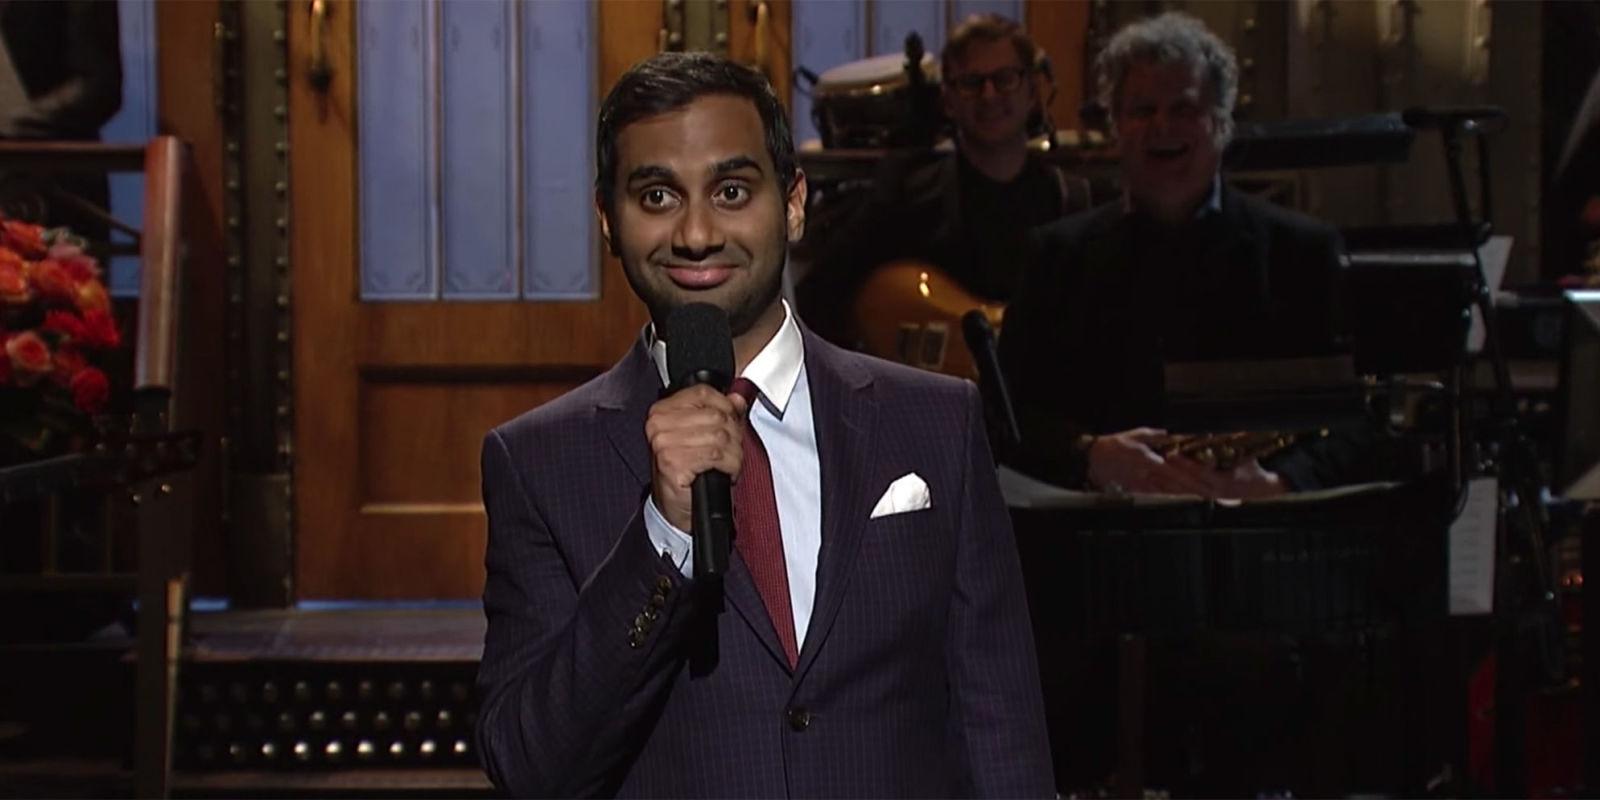 Aziz Ansari Delivered a Hilarious Anti-Racist SNL Monologue